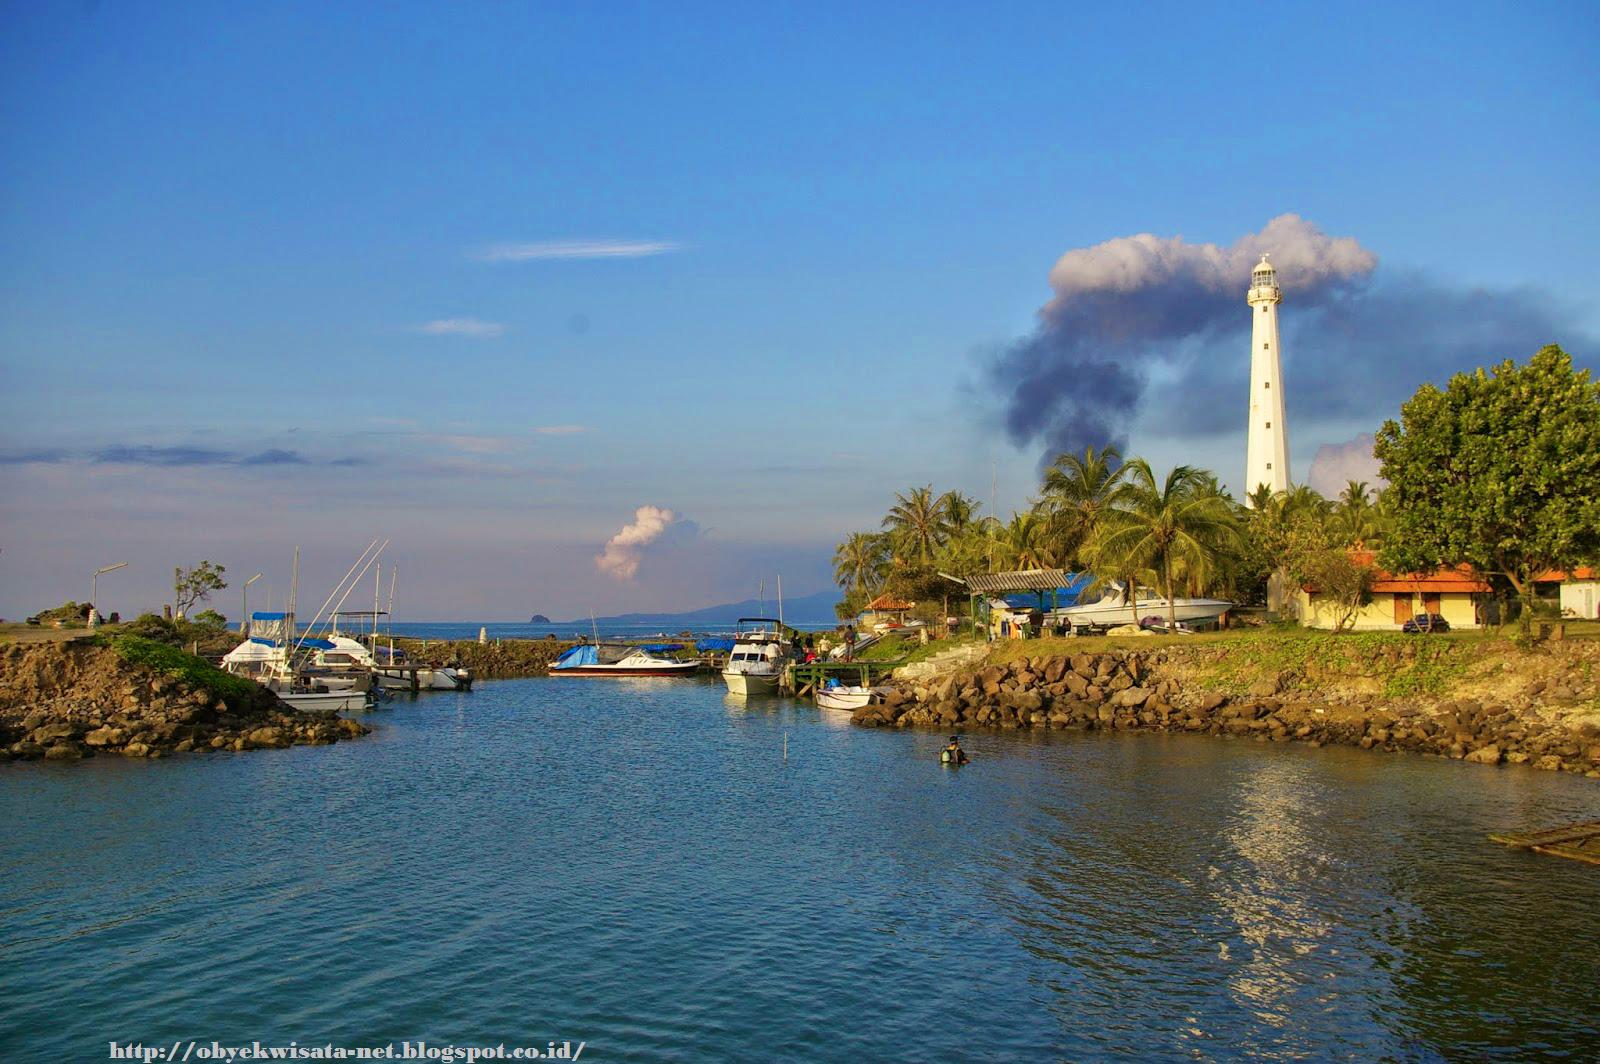 Mengenal Lebih Dekat Pantai Anyer Banten Obyek Wisata Net Lokasi